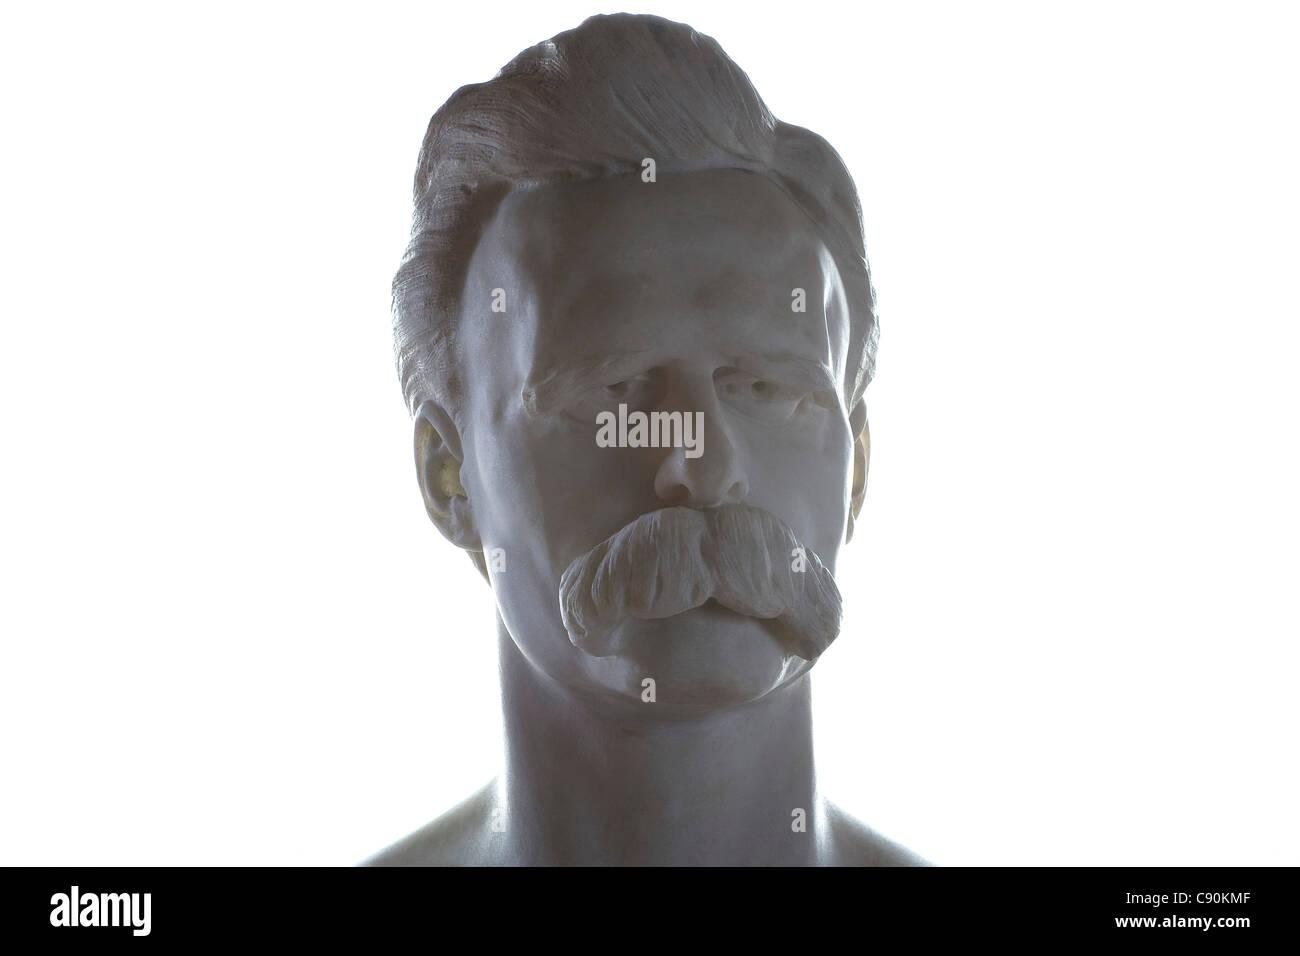 Bust of Friedrich Nietzsche, Nietzsche Archive, Weimar, Thuringia, Germany, Europe - Stock Image